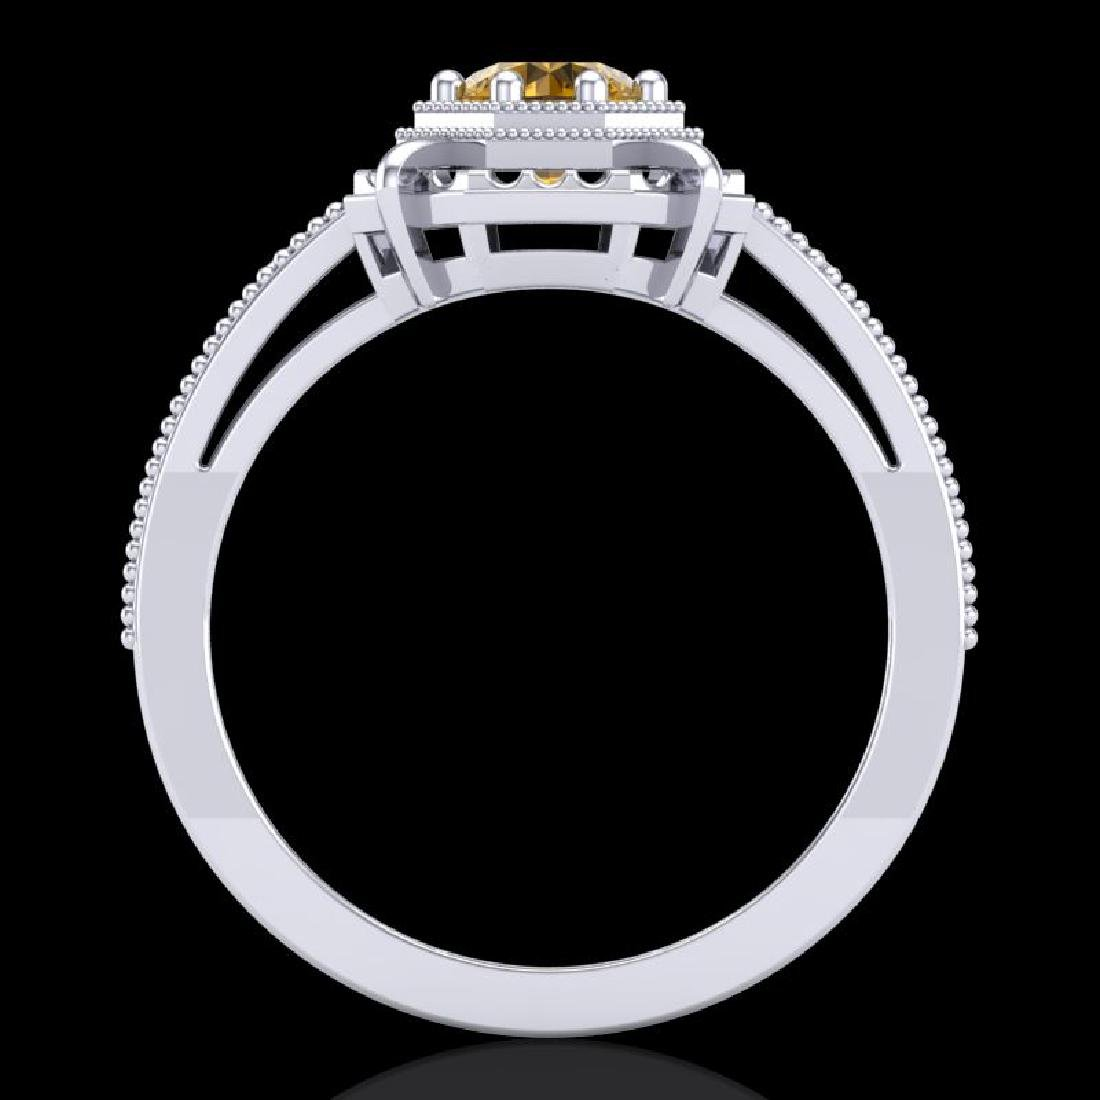 0.53 CTW Intense Fancy Yellow Diamond Engagement Art - 3